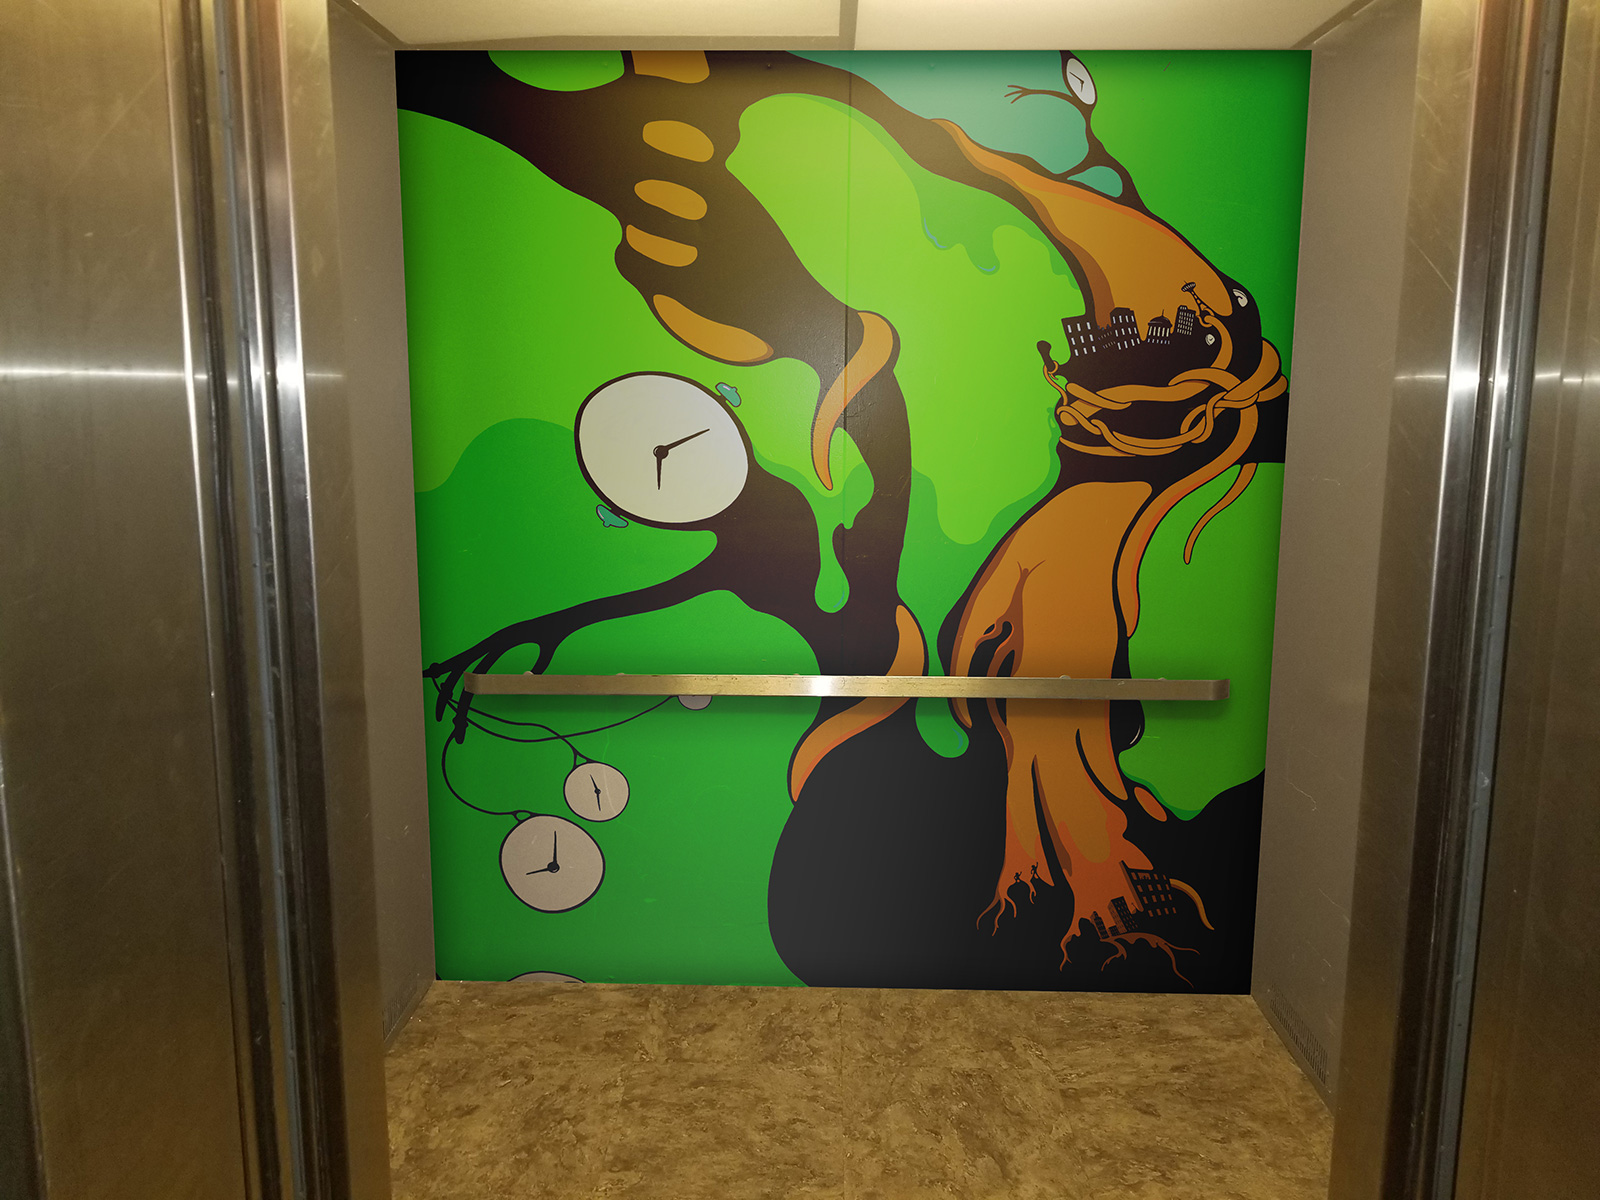 TFL-Elevator-mockup-06